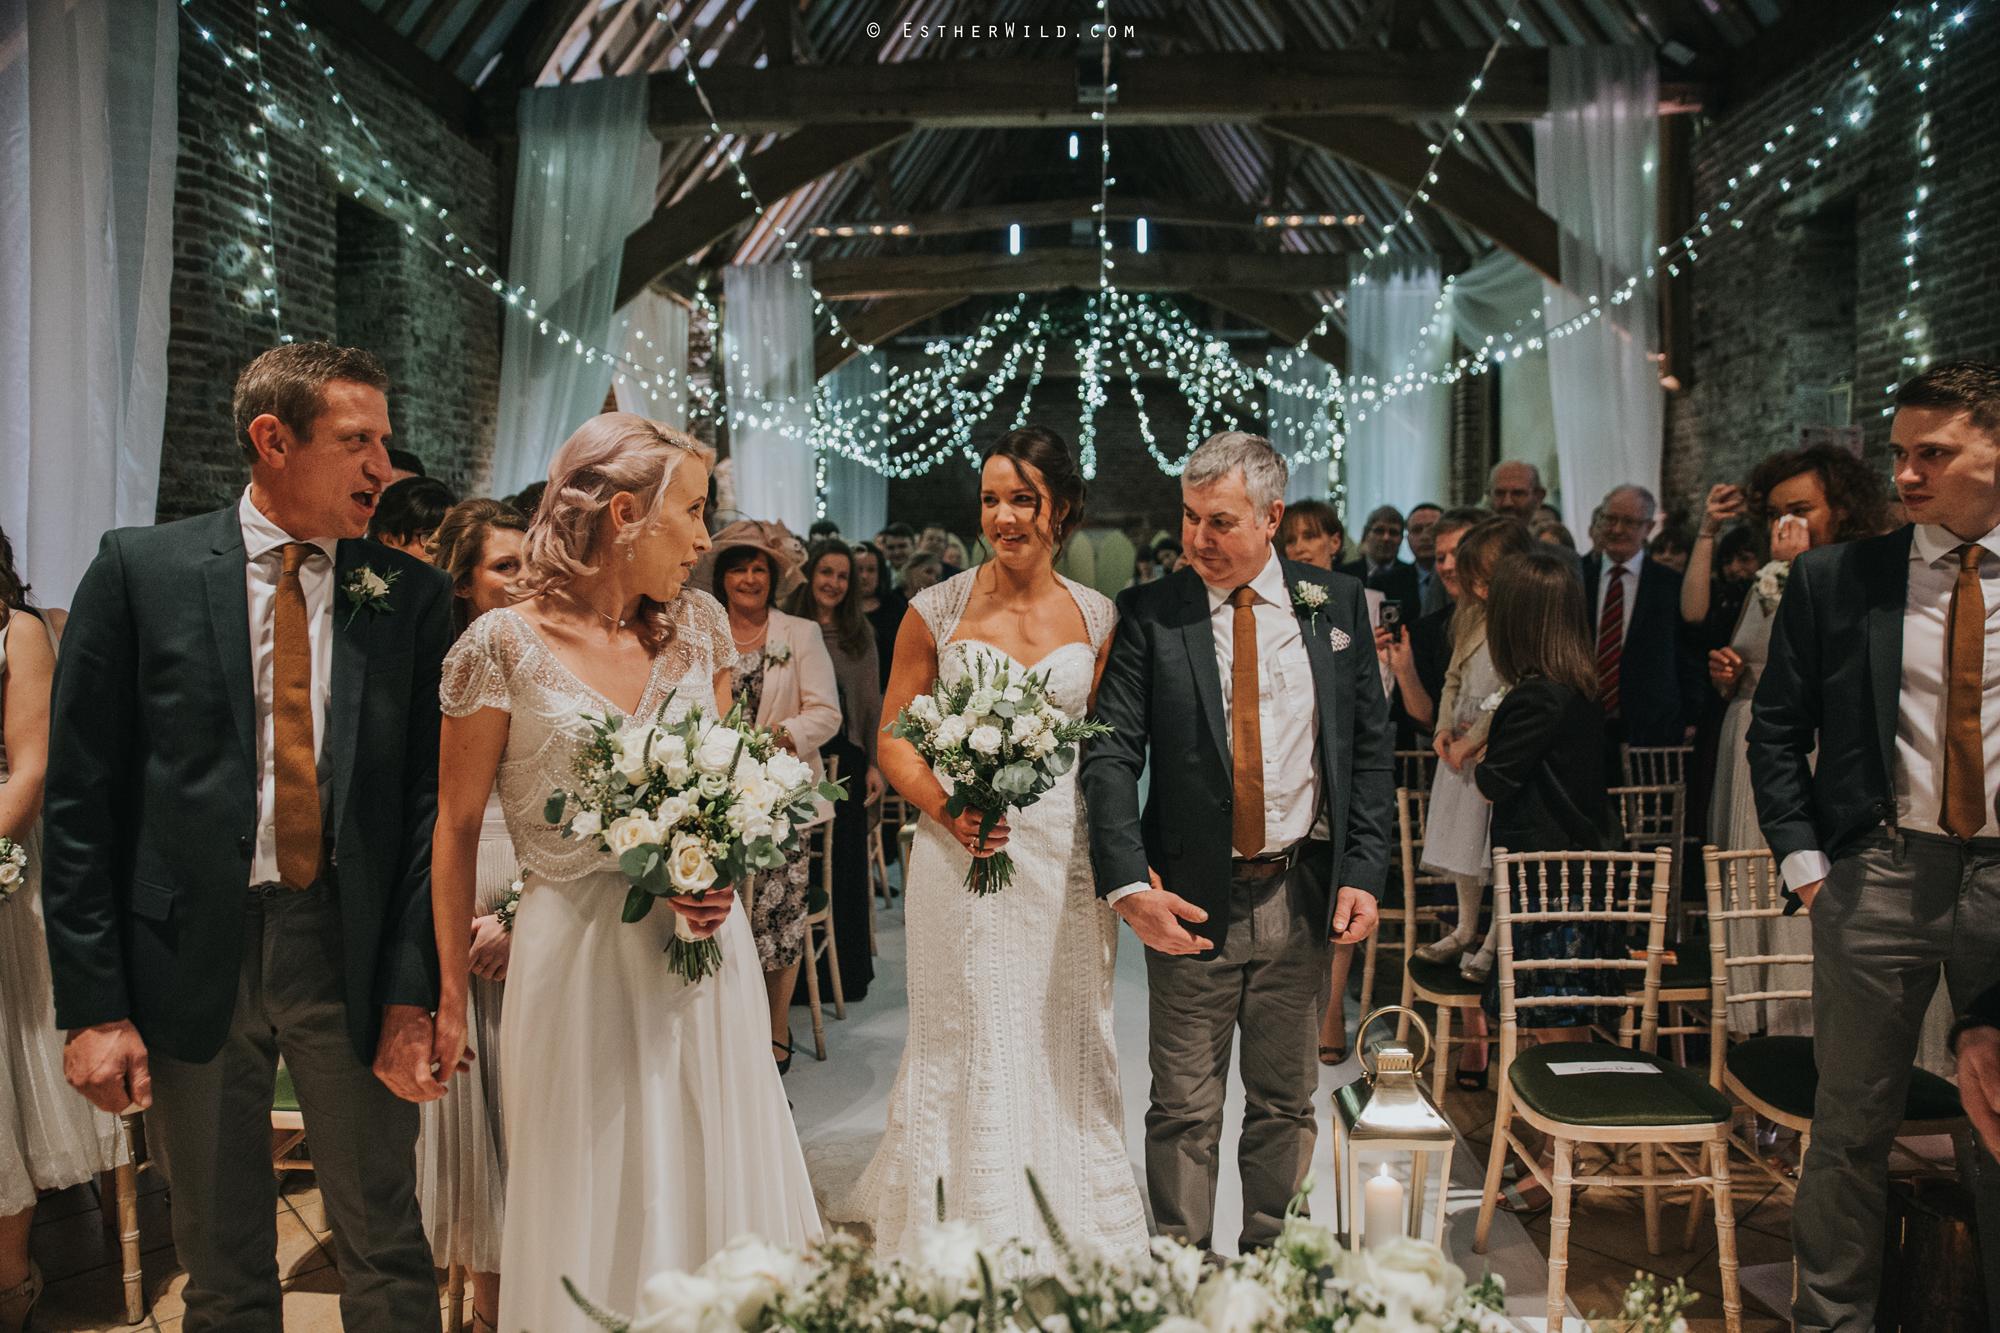 Elms_Barn_Weddings_Suffolk_Photographer_Copyright_Esther_Wild_IMG_1136.jpg